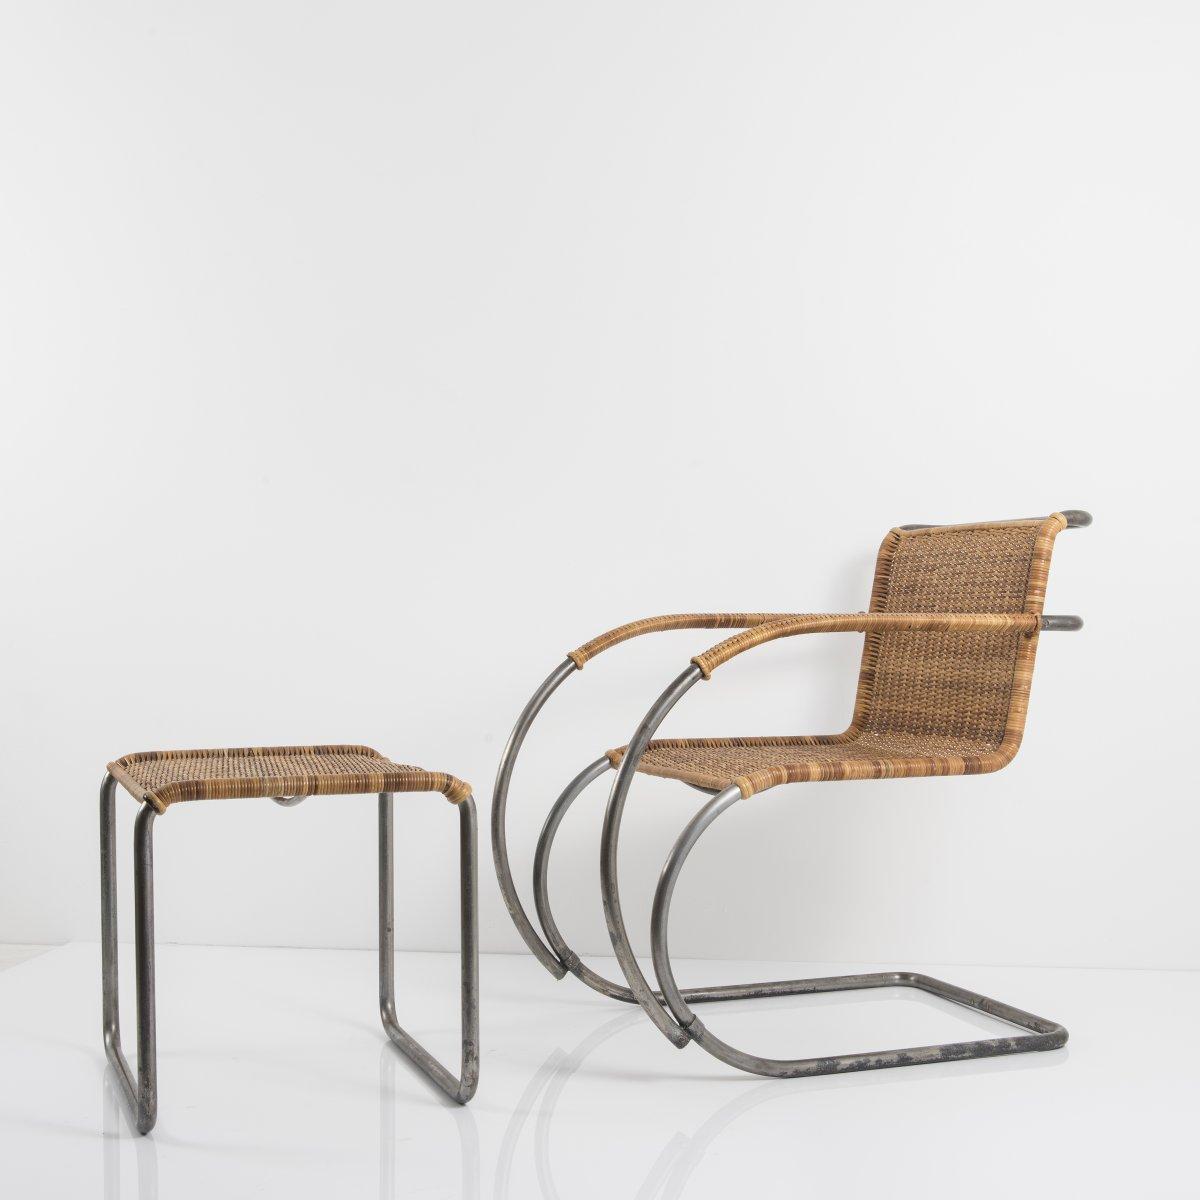 Los 31 - Ludwig Mies van der Rohe, Armlehnsessel 'MR 20', 1927Armlehnsessel 'MR 20', 1927H. 81 x 55,5 x 84